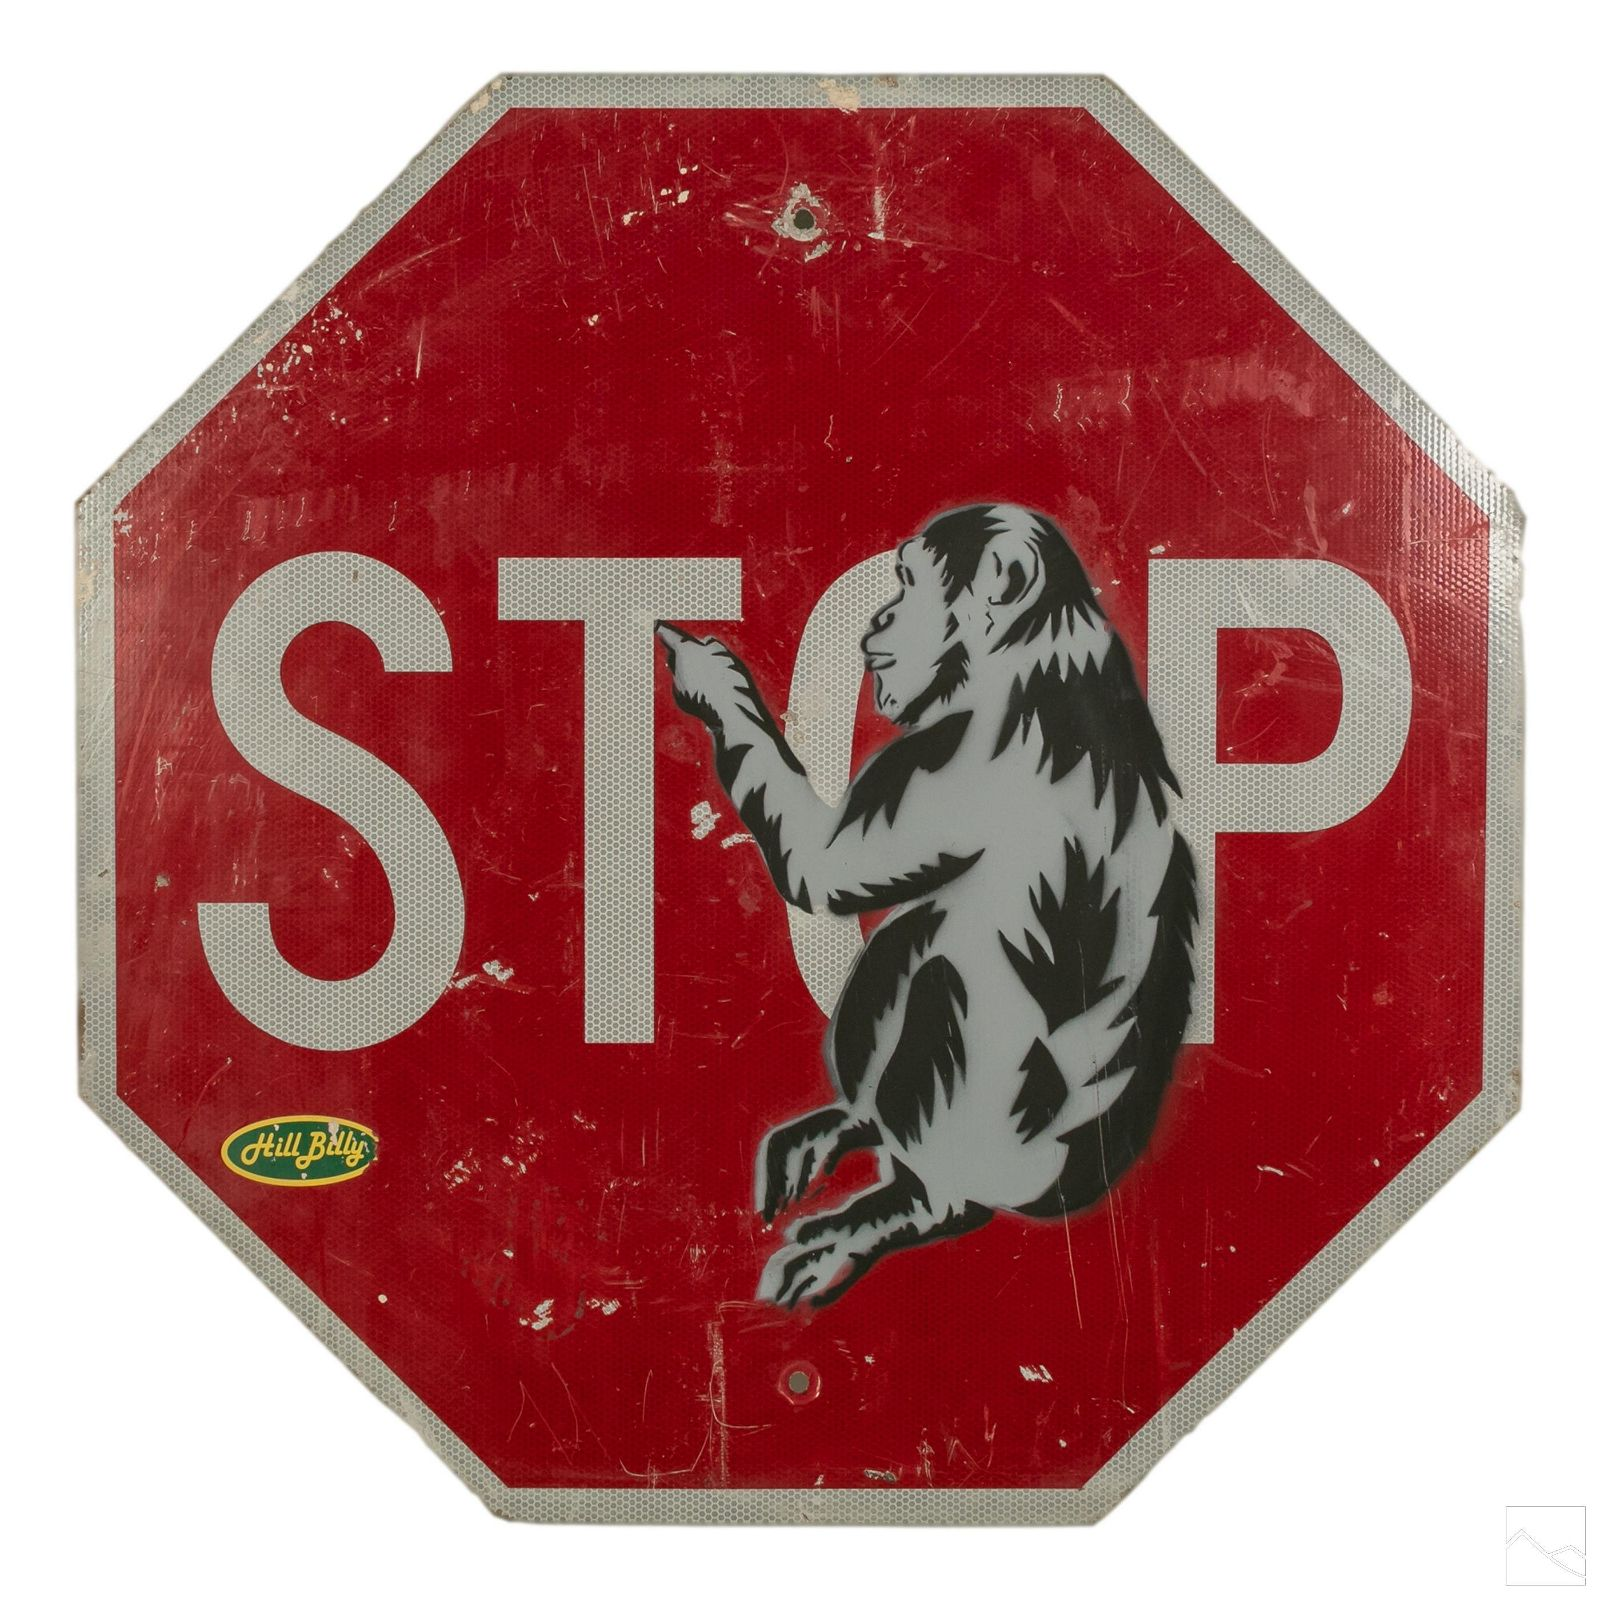 Banksy Style STOP SIGN w/ Monkey Graffiti Painting